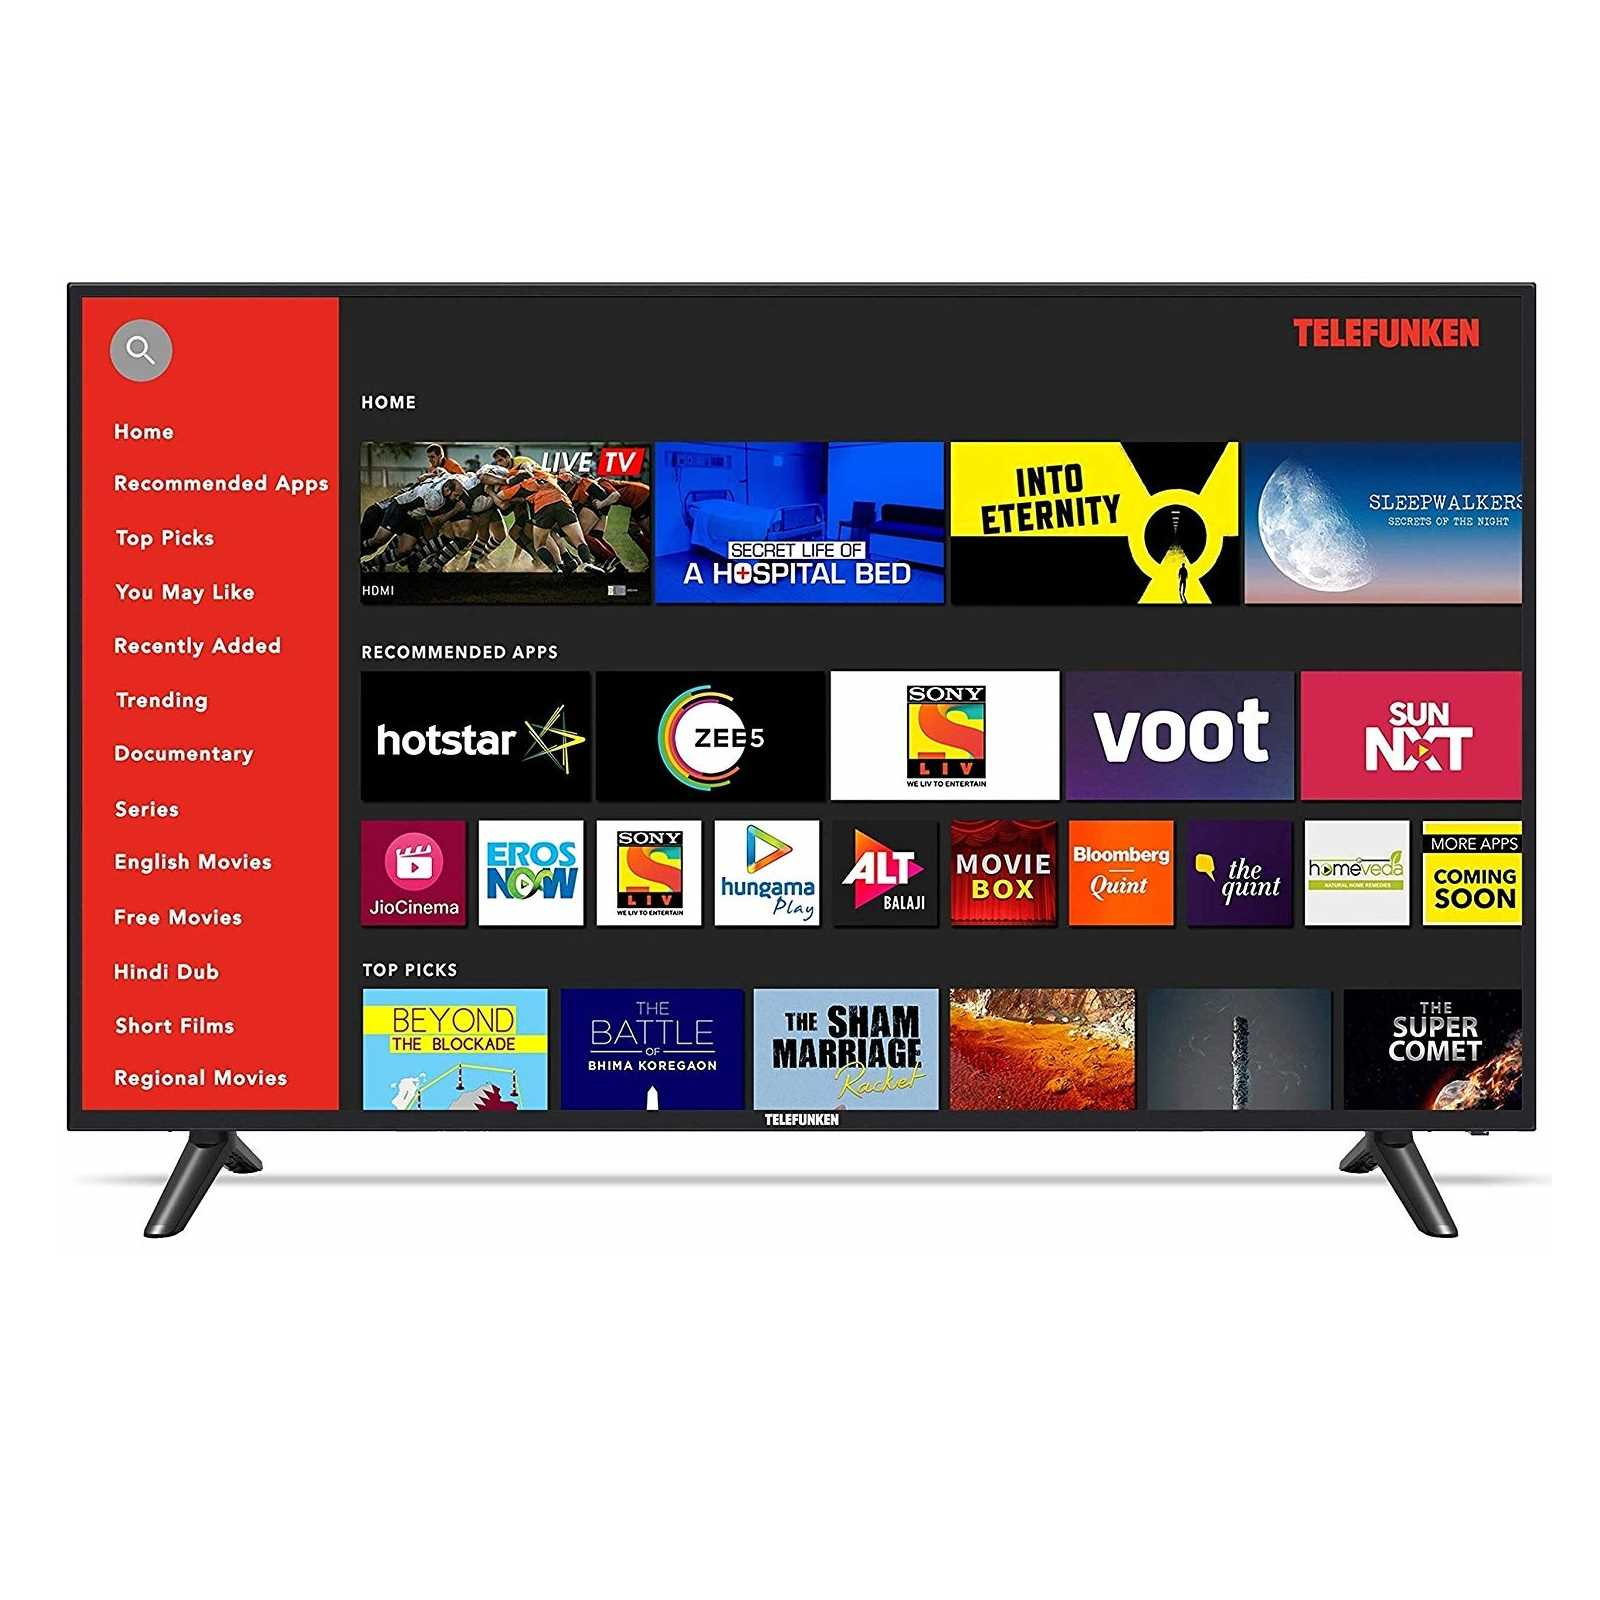 Telefunken TFK55KS 55 Inch 4K Ultra HD Smart LED Television